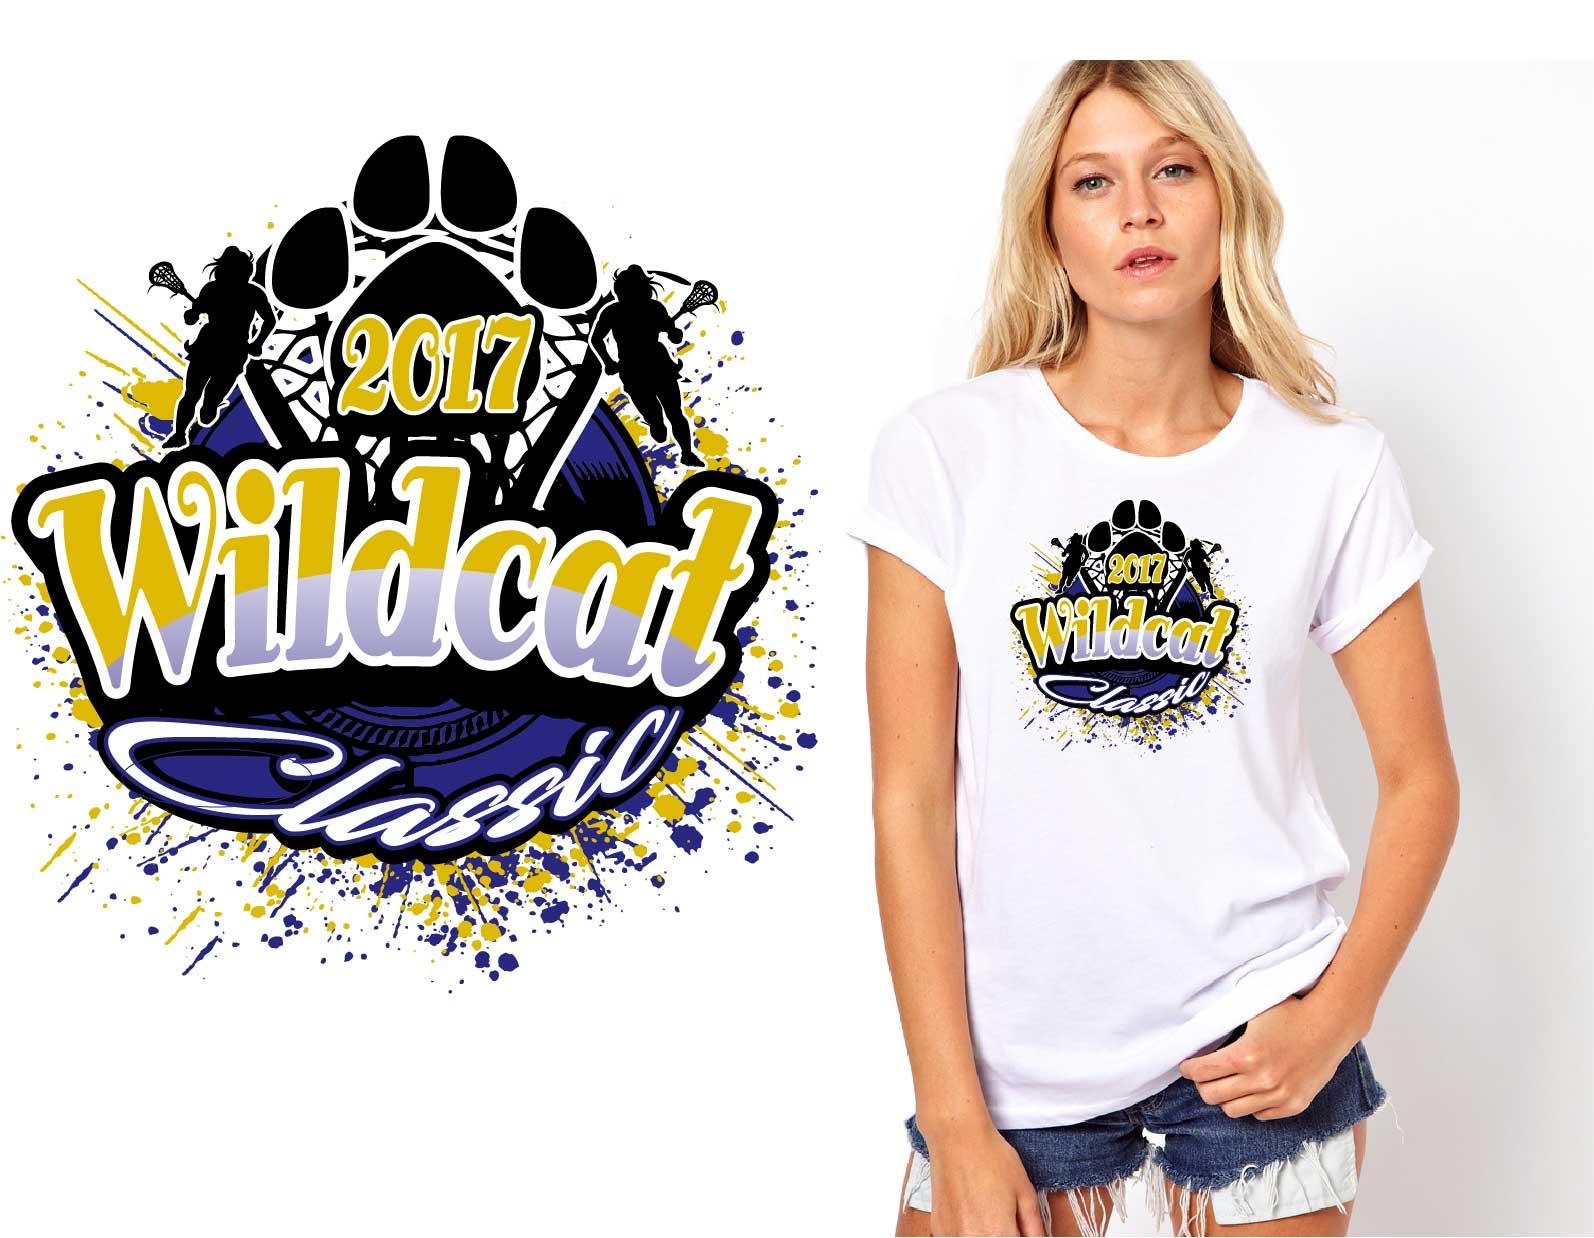 Tshirt vector logo design for 5.13.17 Wildcat Classic .lacrosse